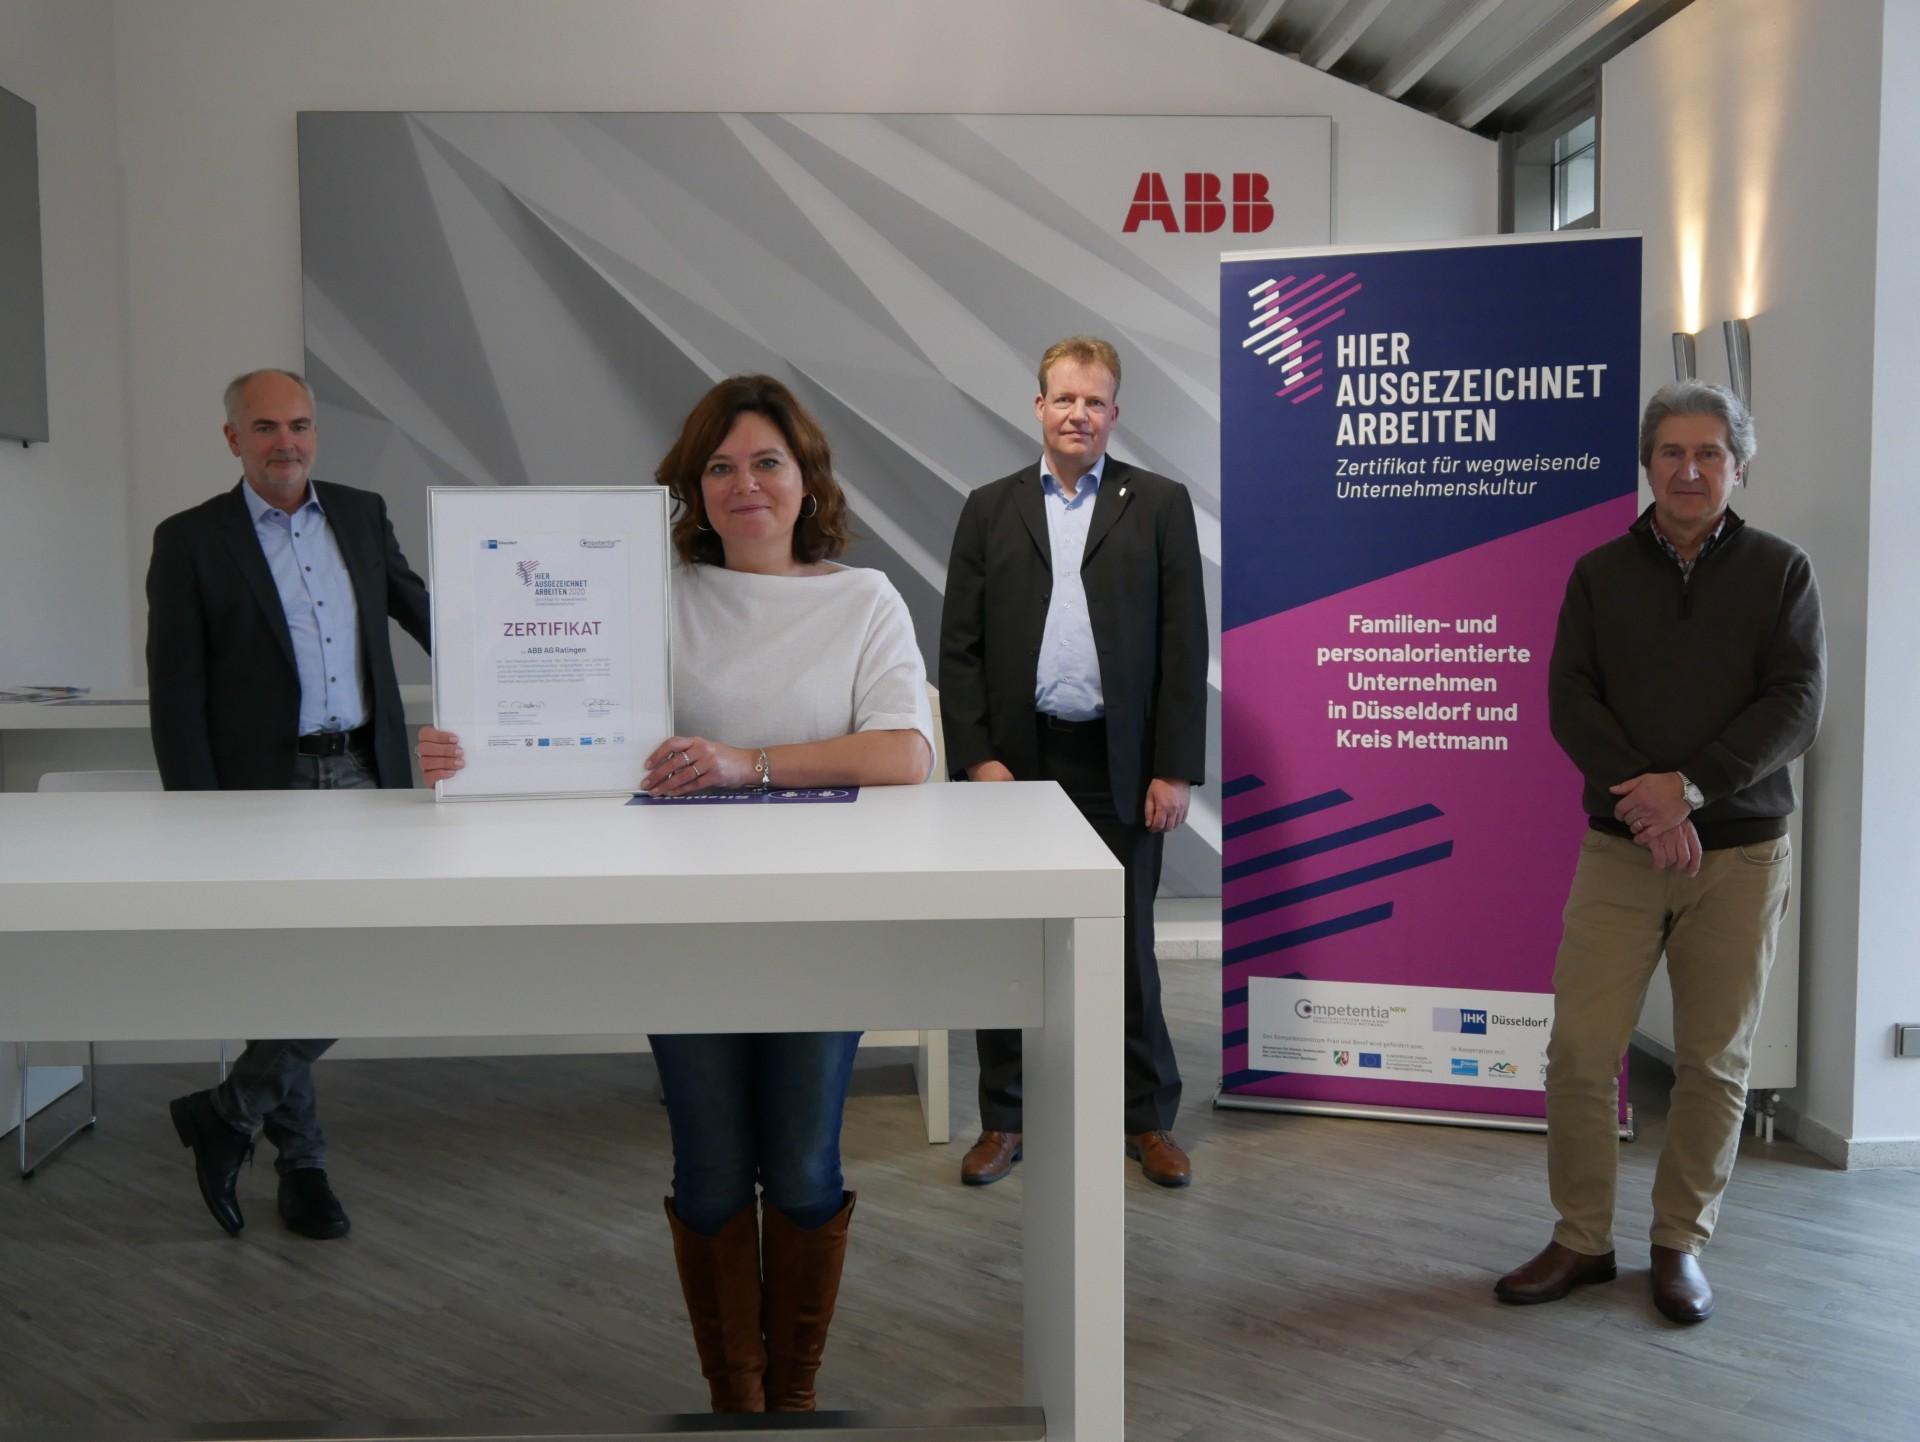 ABB Übergabe Zertifikat